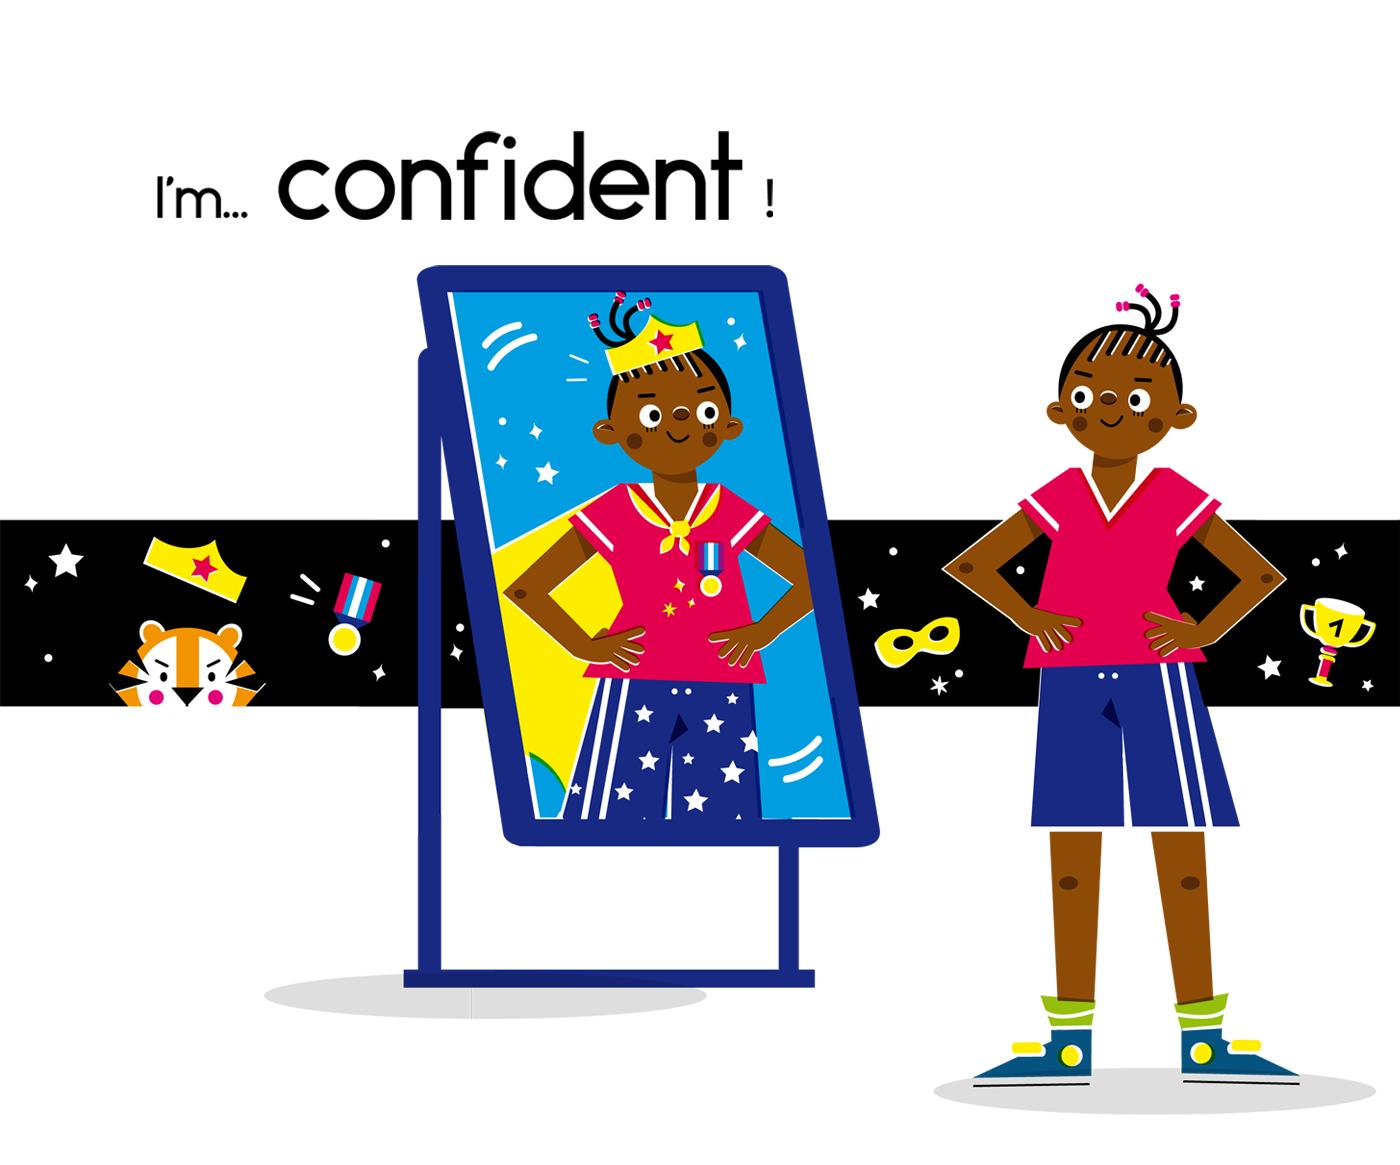 Confident - Vector Illustration © Emeline Barrea, All rights reserved